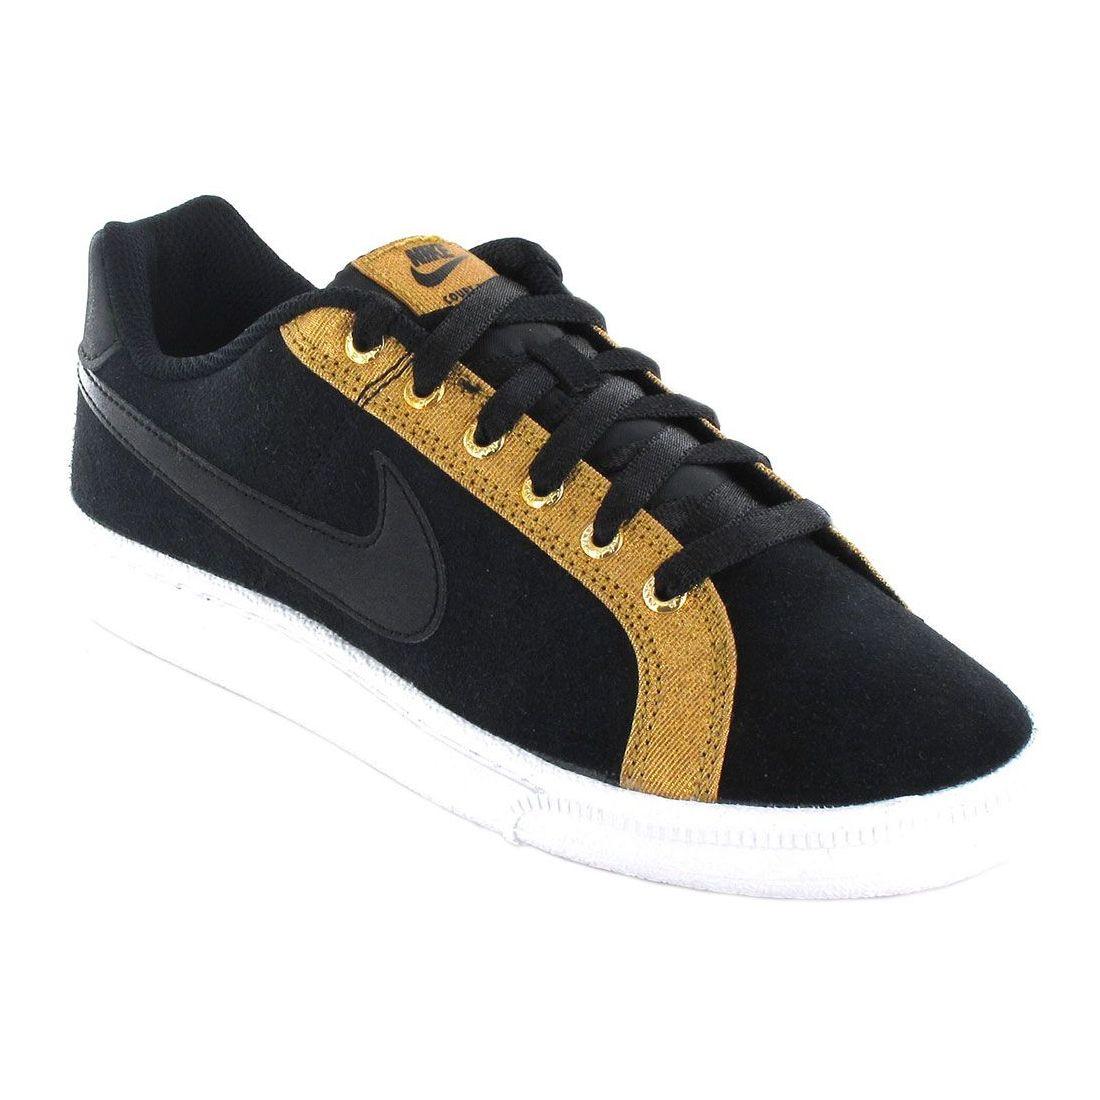 infinito Cuerpo residuo  Calzado Casual Mujer - Nike Court Royale Prem W negro l Todo-Deporte.com